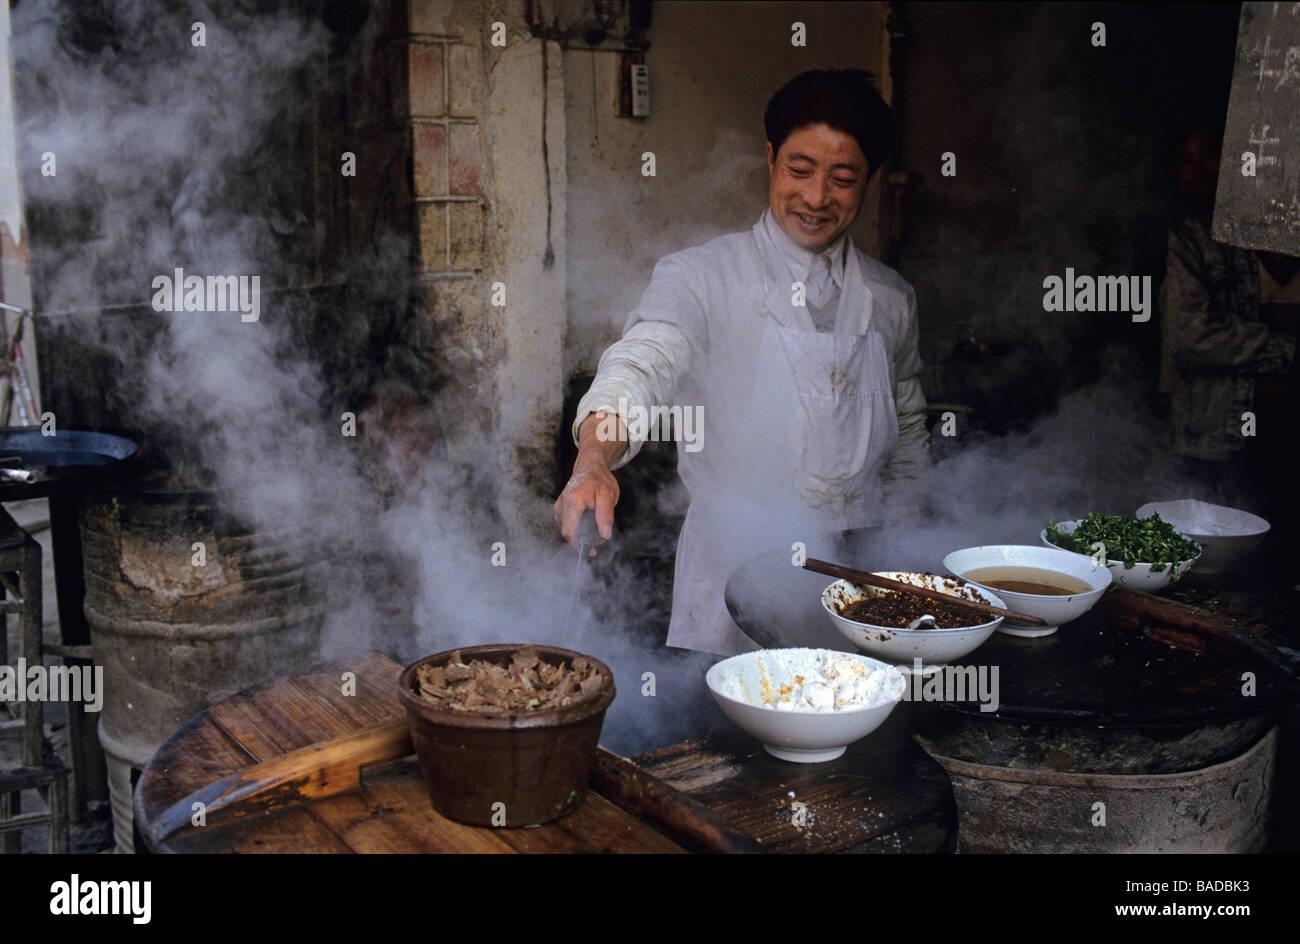 Chine, Jiangsu province, Nanjing, Confucius temple district, man preparing a dish for a street restaurant - Stock Image